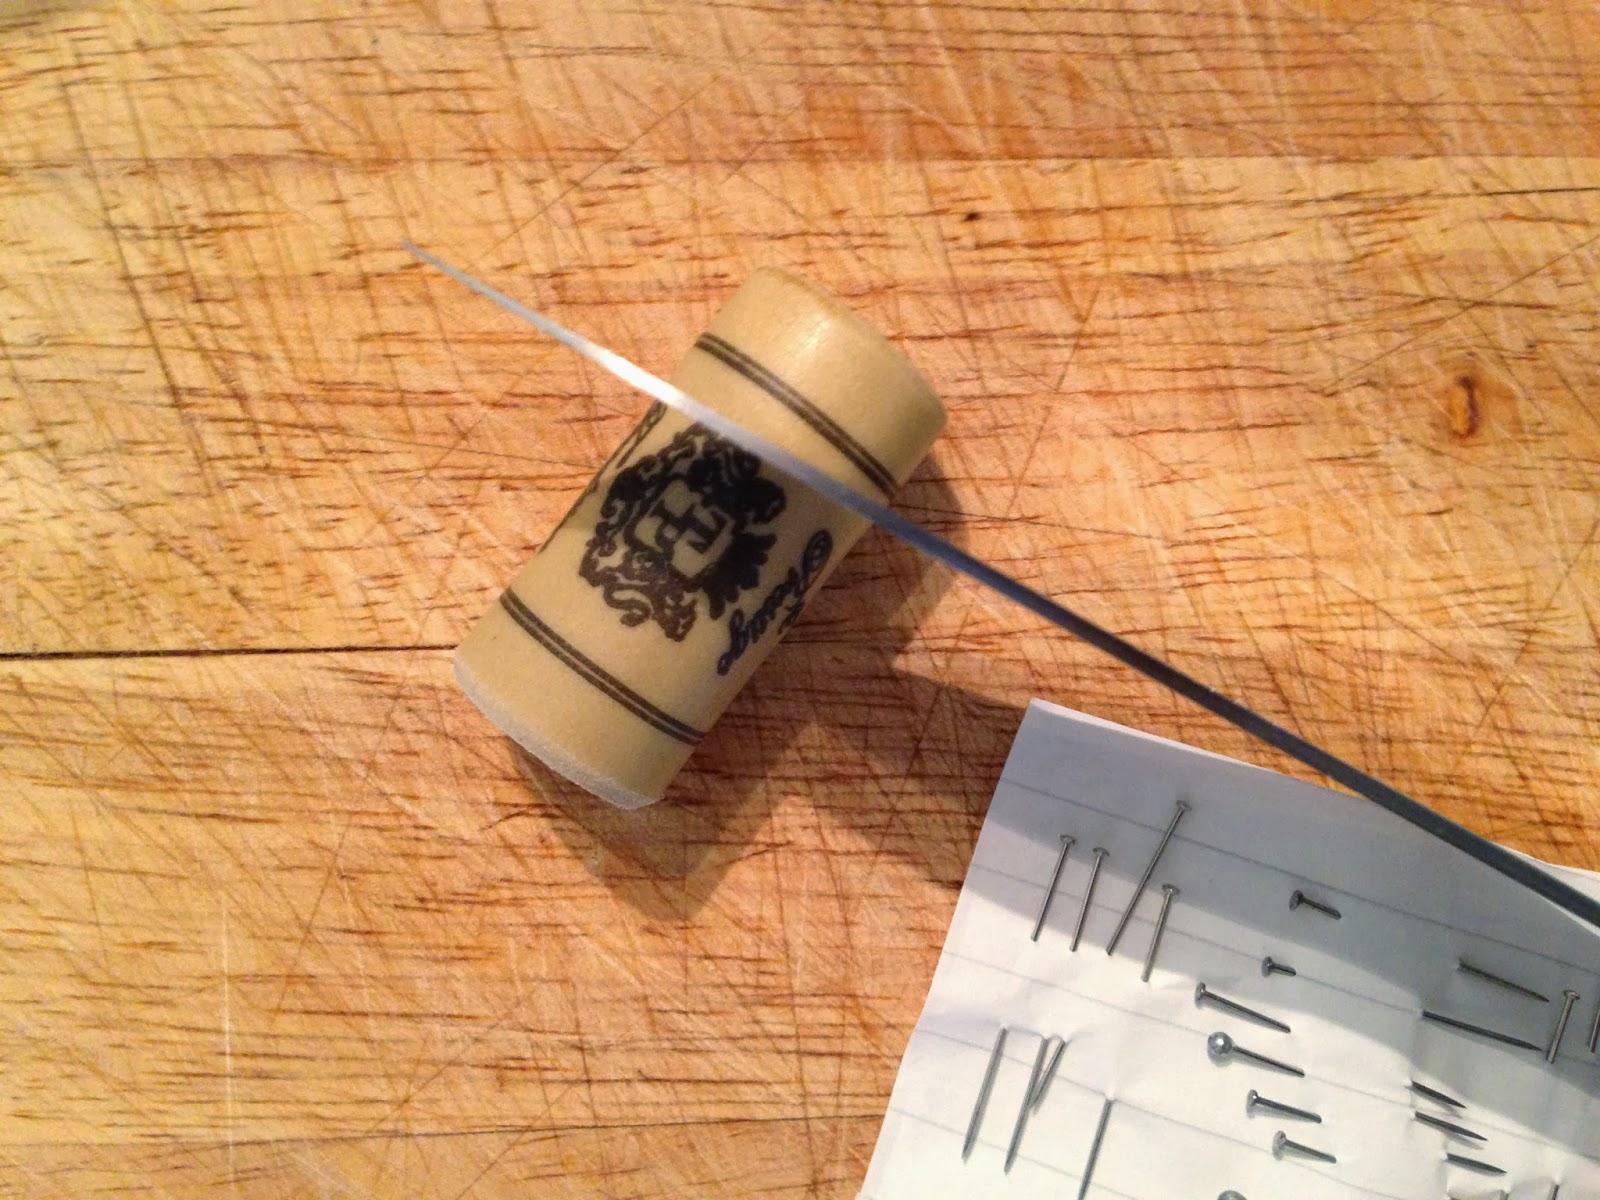 Sloe Prcking Device - Cutting the Cork